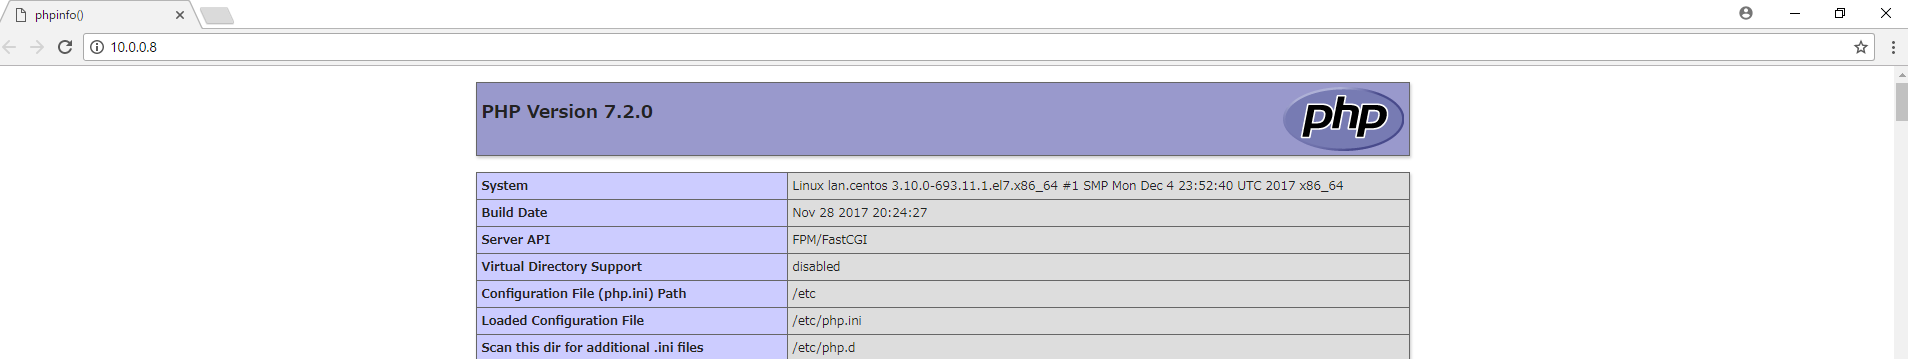 phpとlinuxパーミッション - Qiita